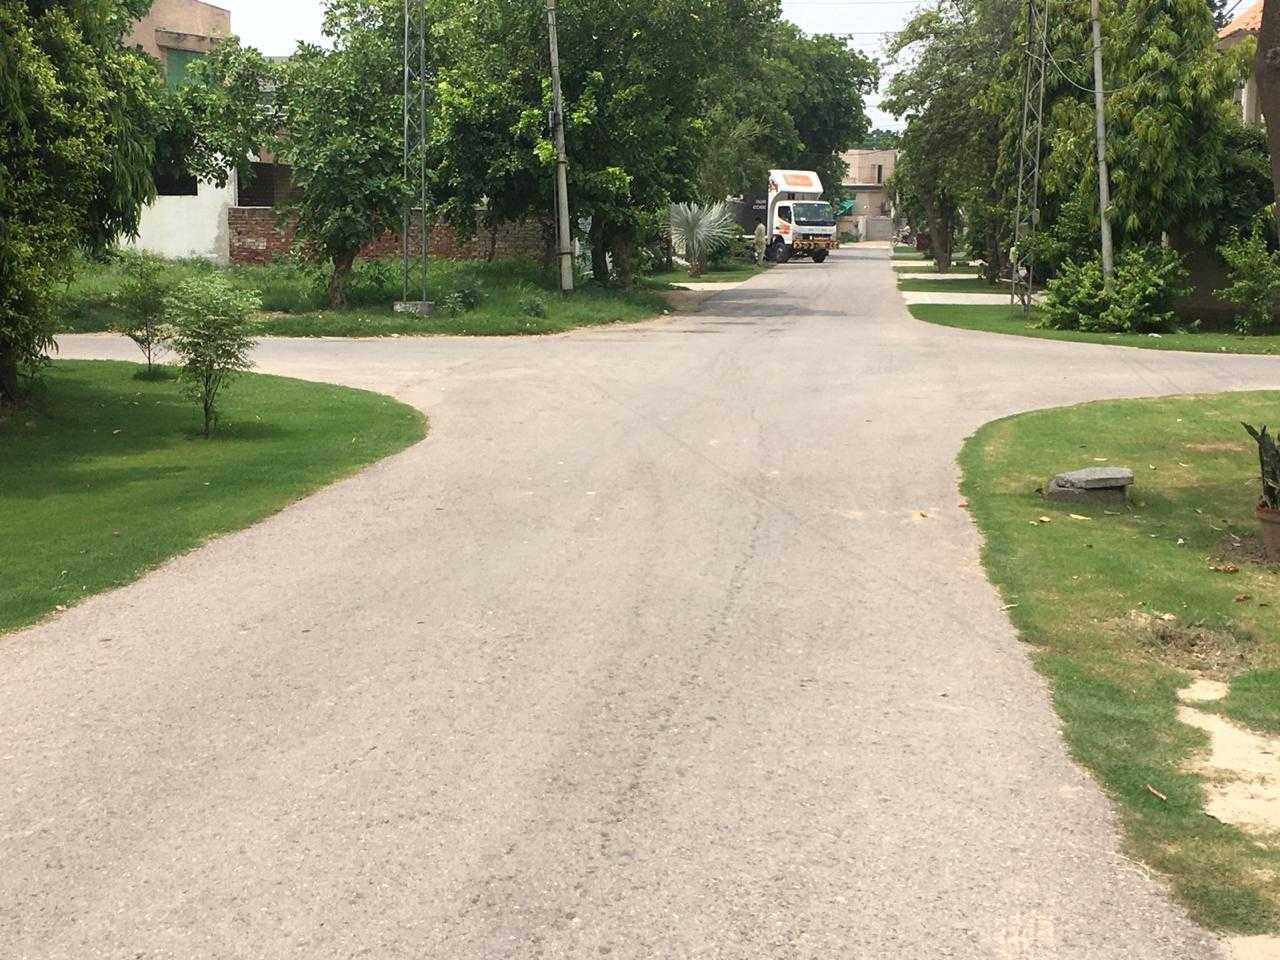 25 Marla Bungalow DHA Phase III Lahore